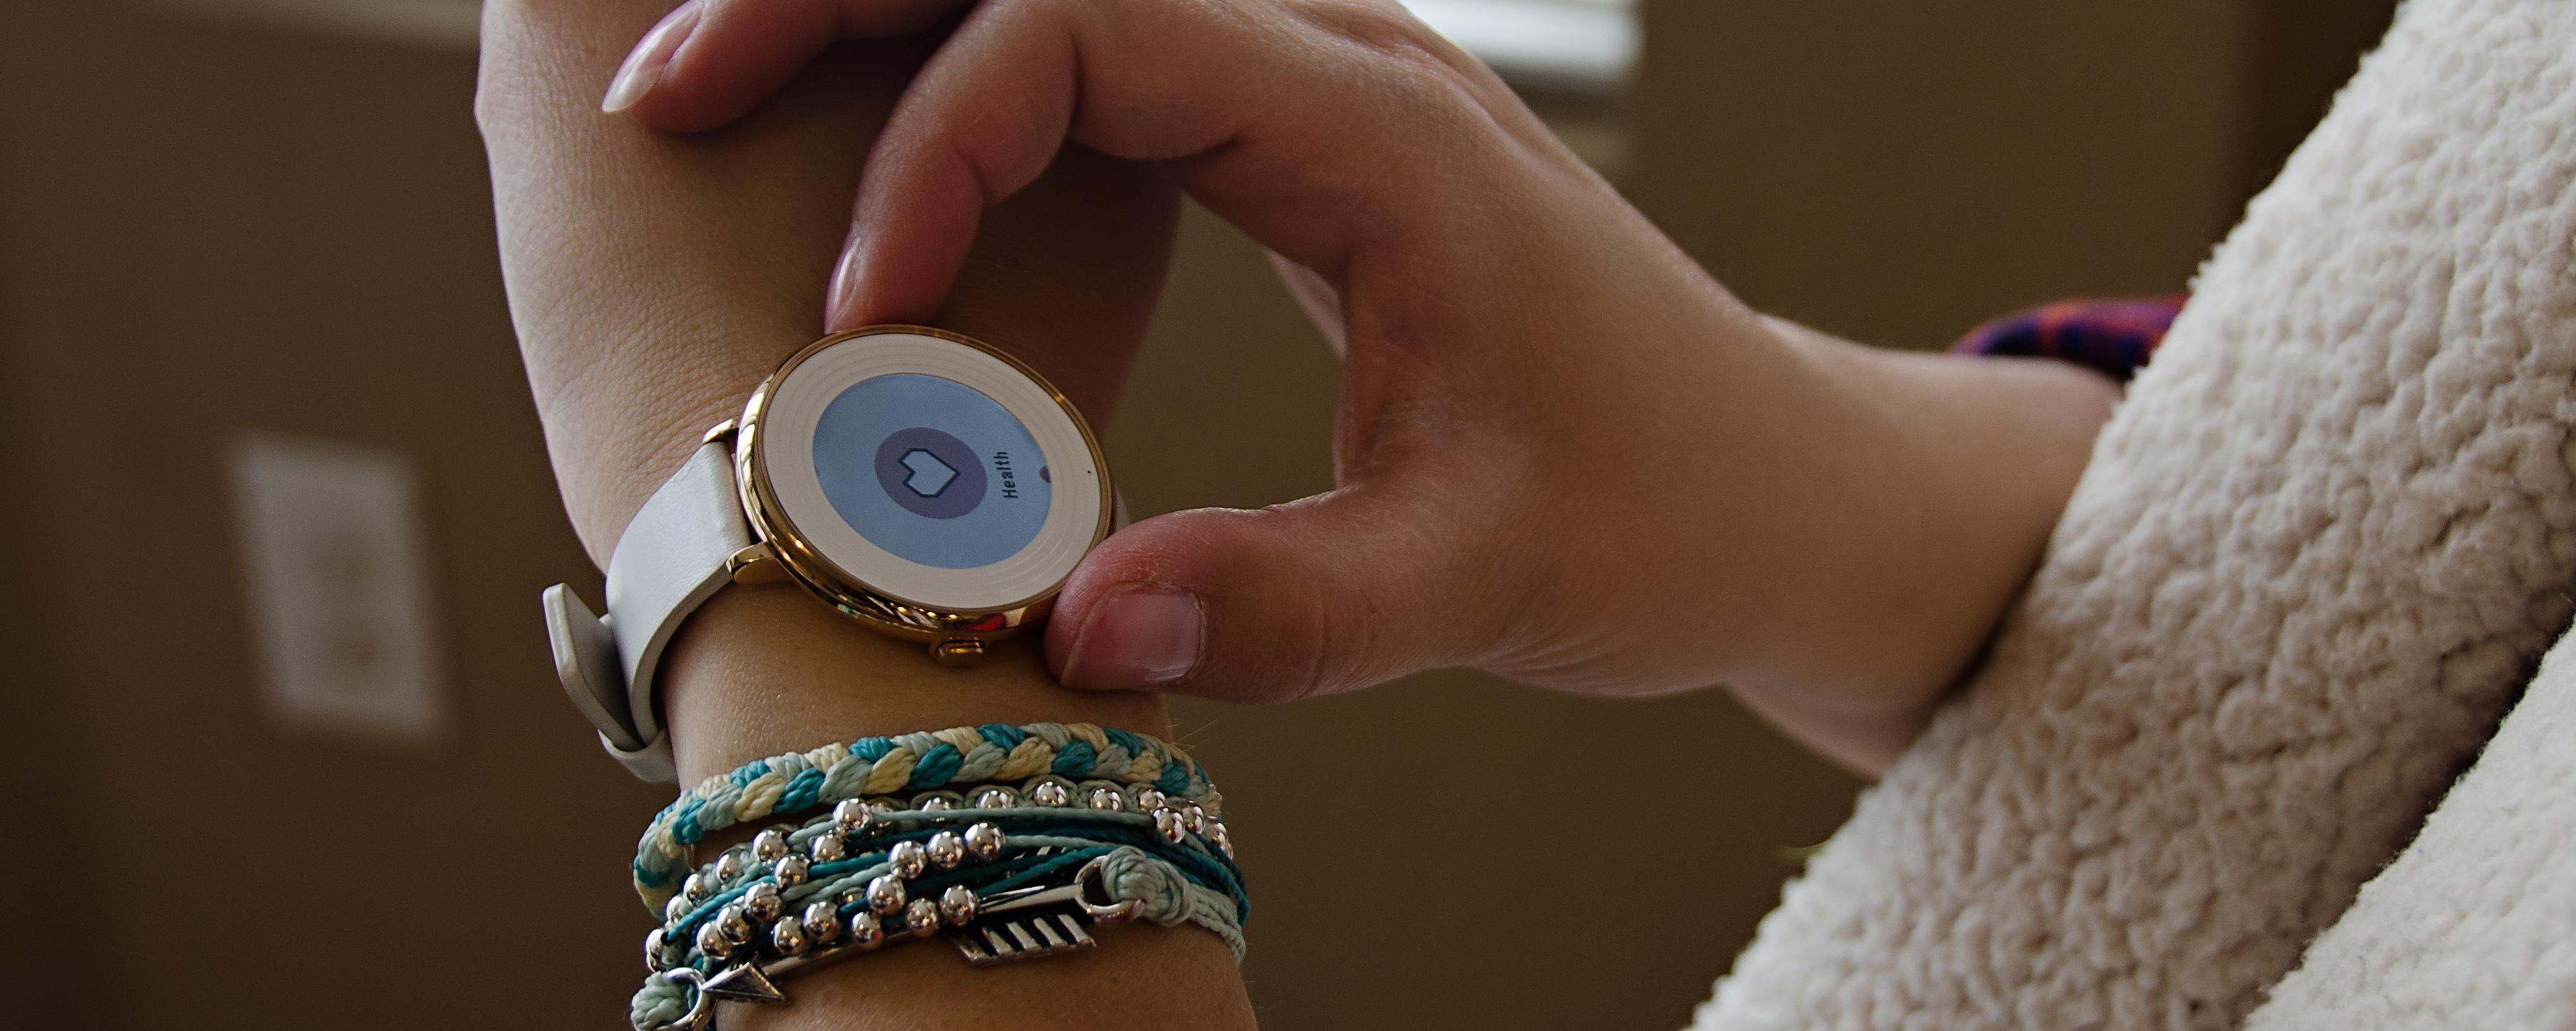 Review: Pebble Health vs. Fitbit